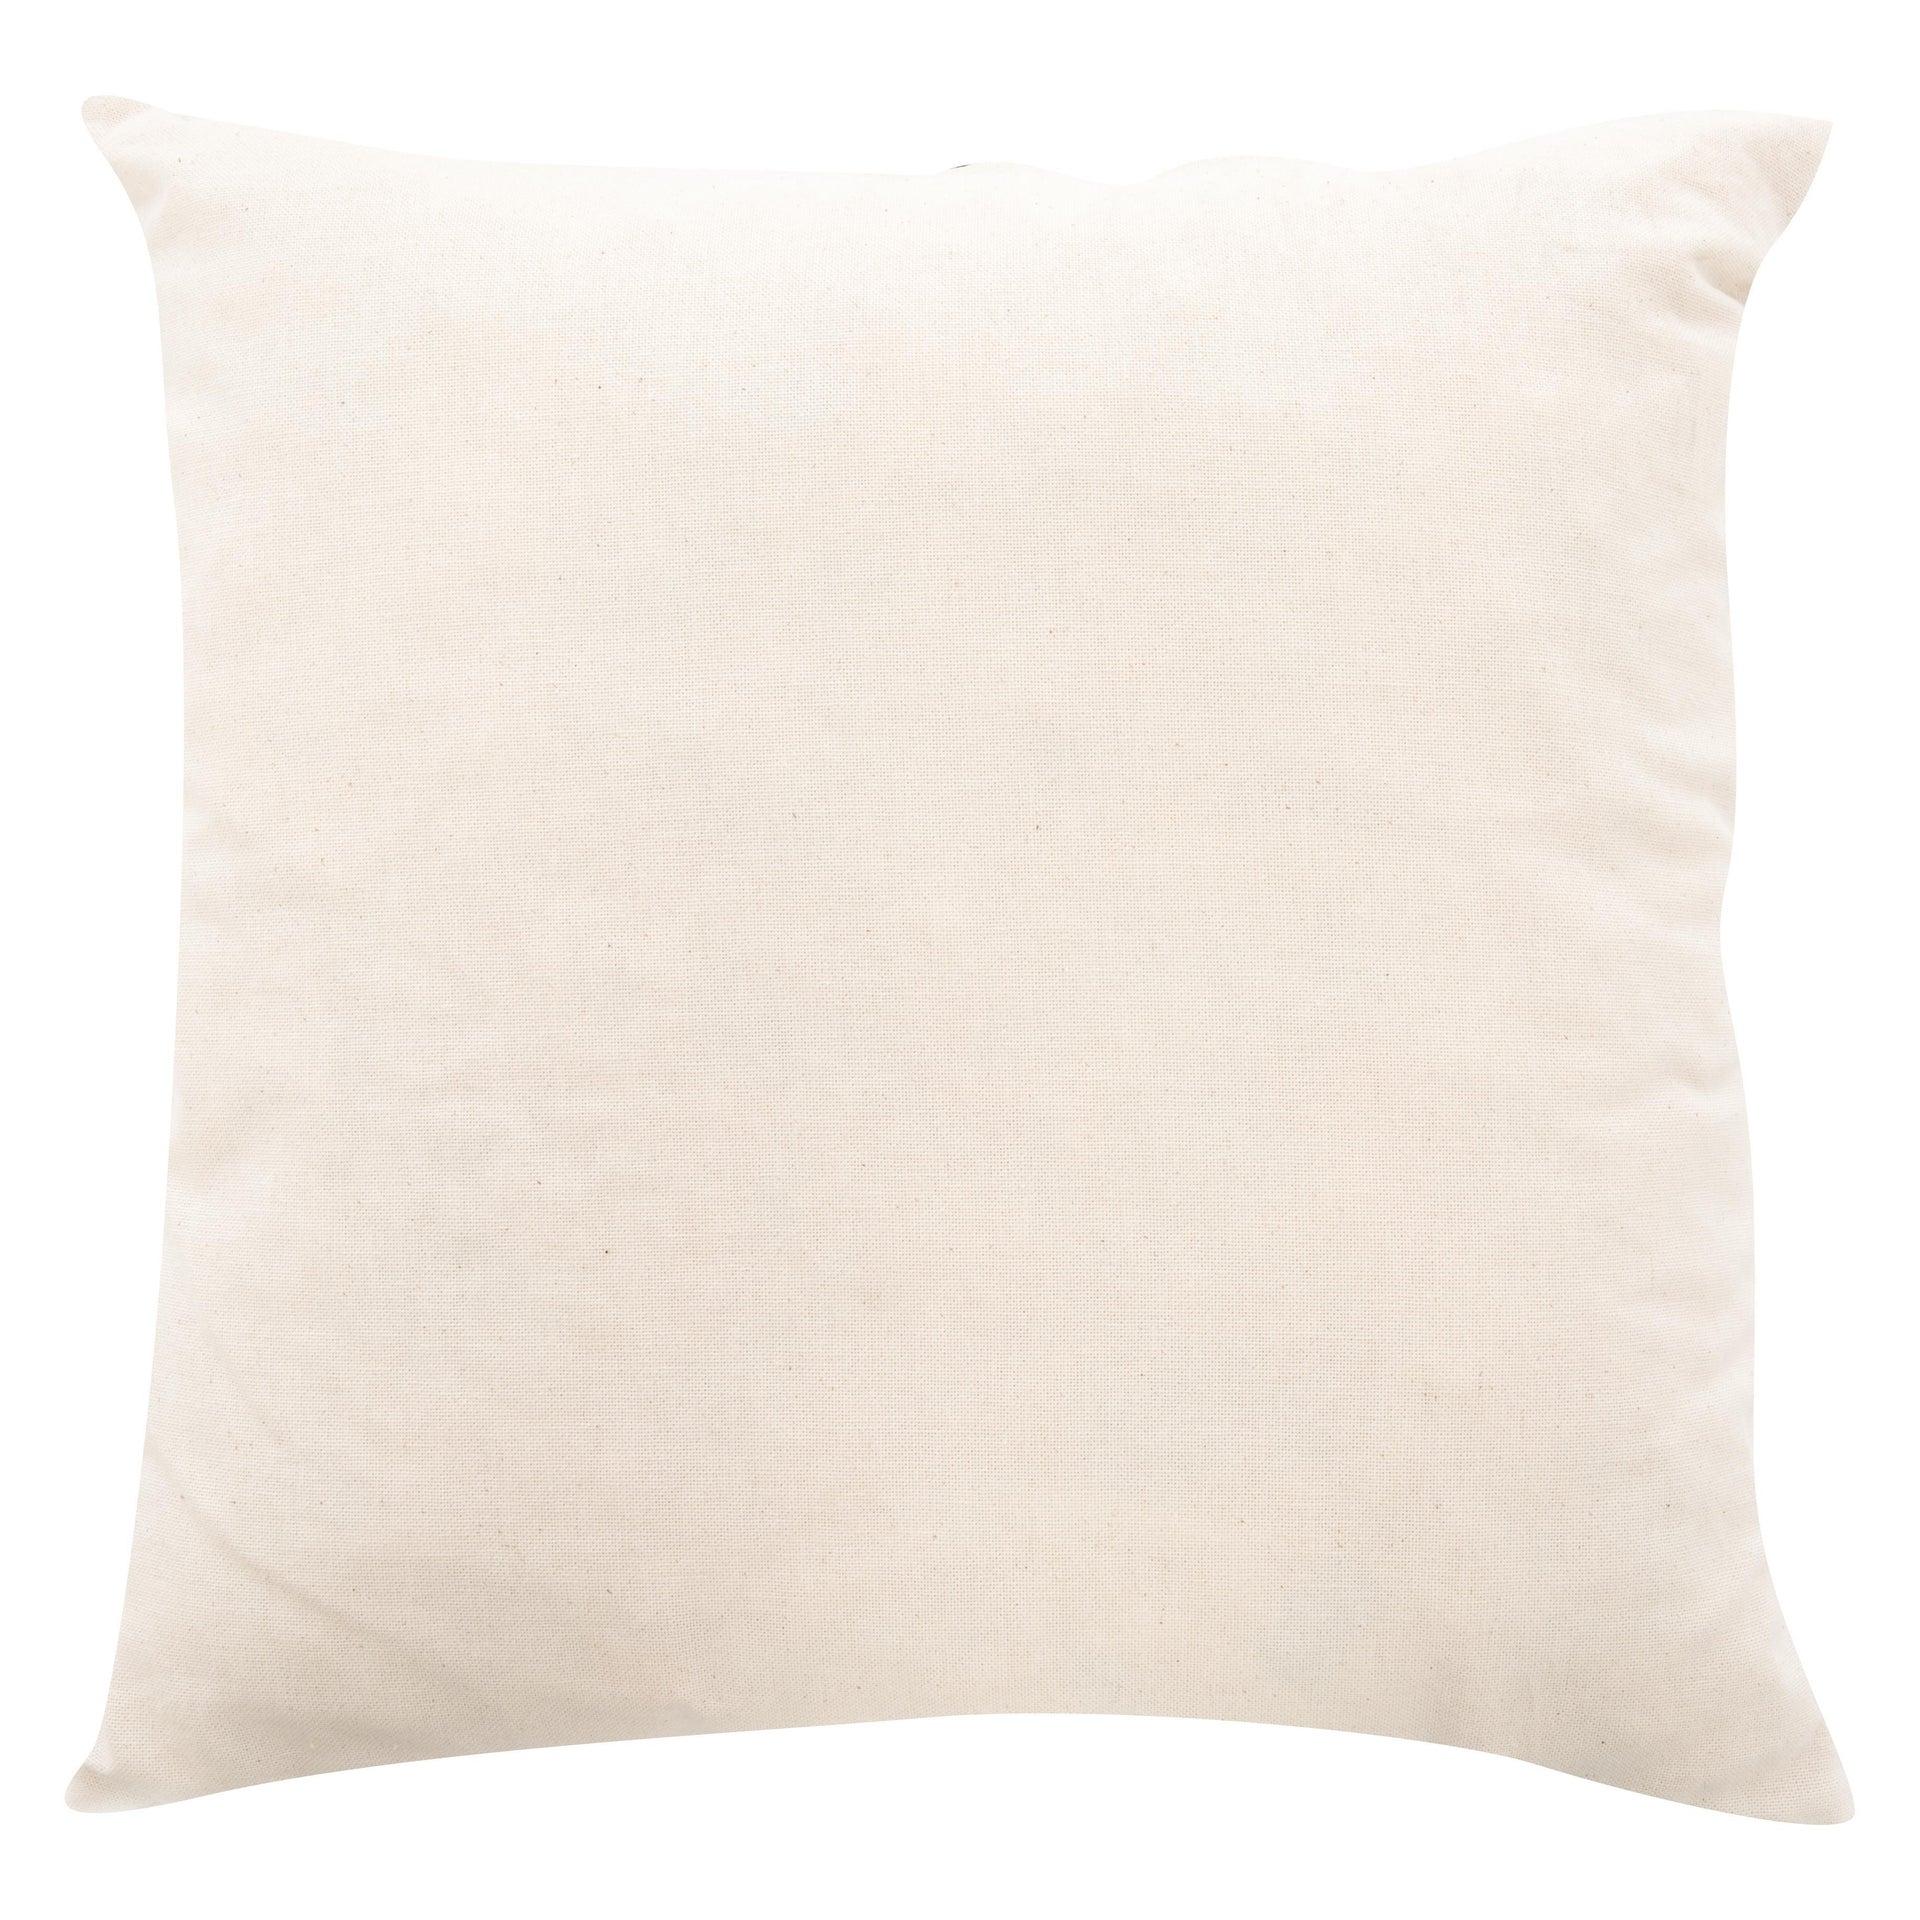 Cuscino da esterno BRASILE multicolore 120 x 80 x Sp 80 cm , 4 pezzi - 8